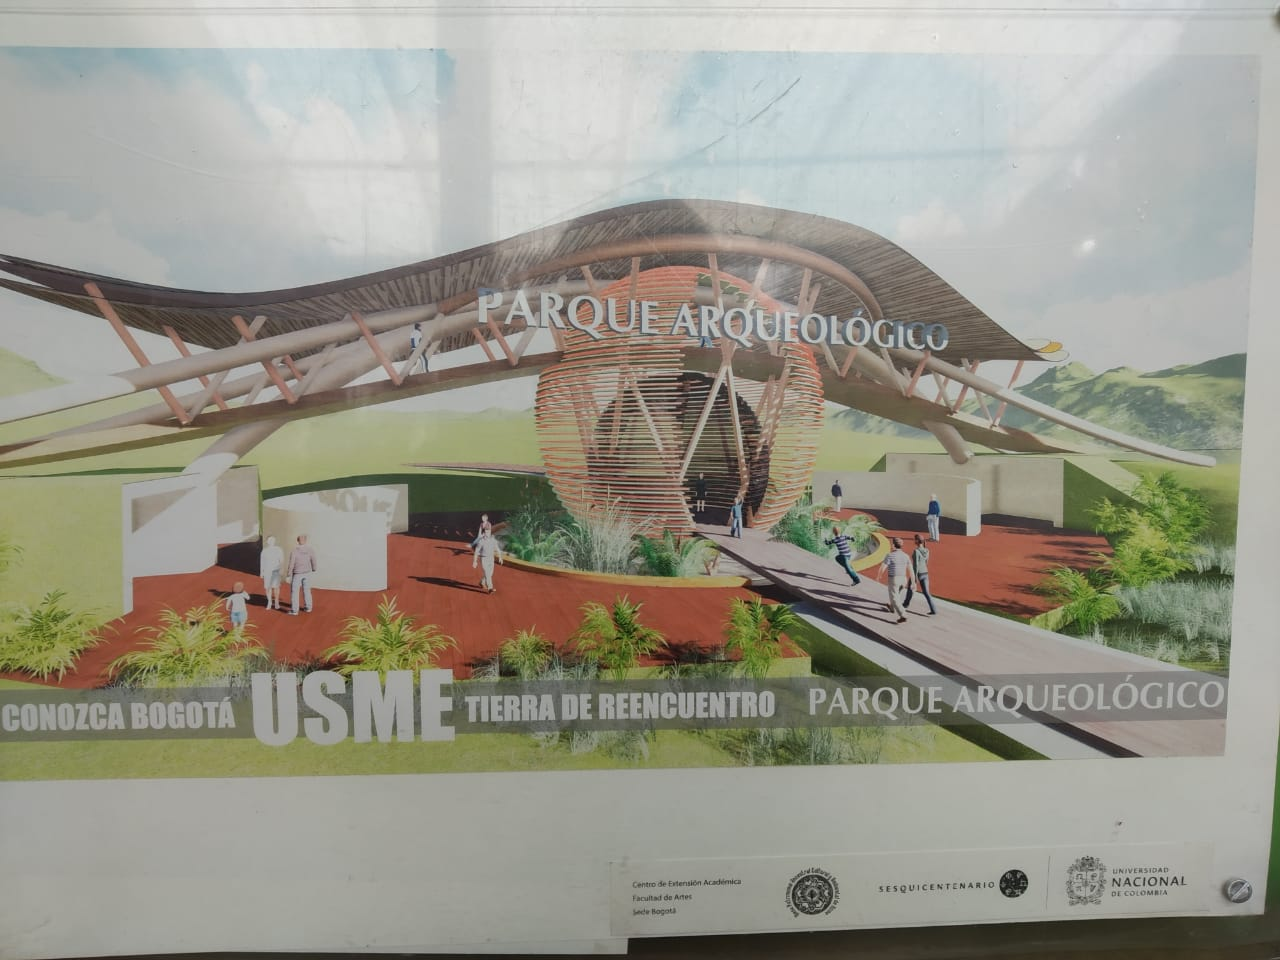 Diseño Parque Arqueológico propuesto por la Mesa de Patrimonio Usmeka